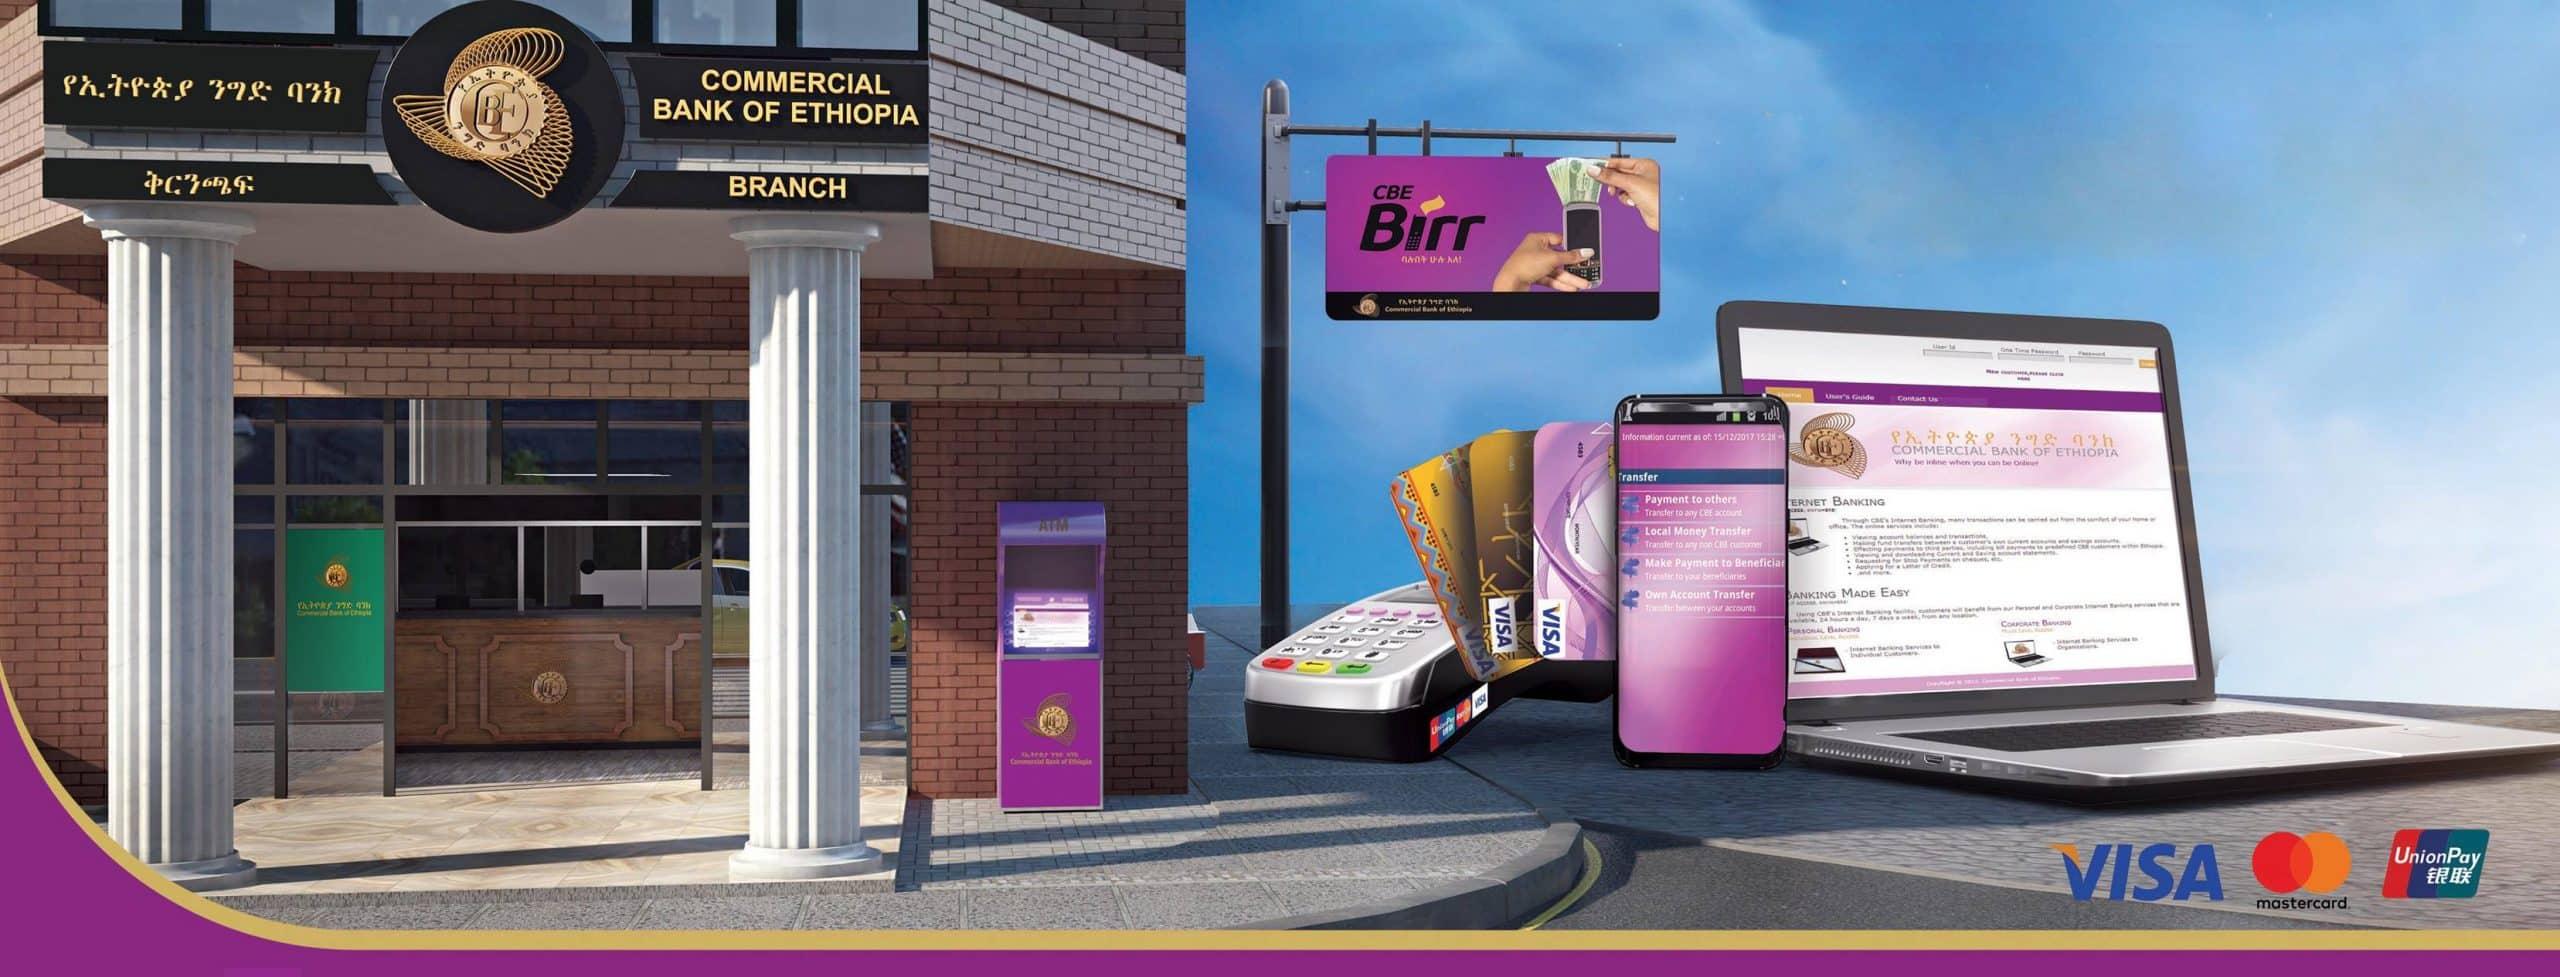 Commercial Bank Of Ethiopia Cbe